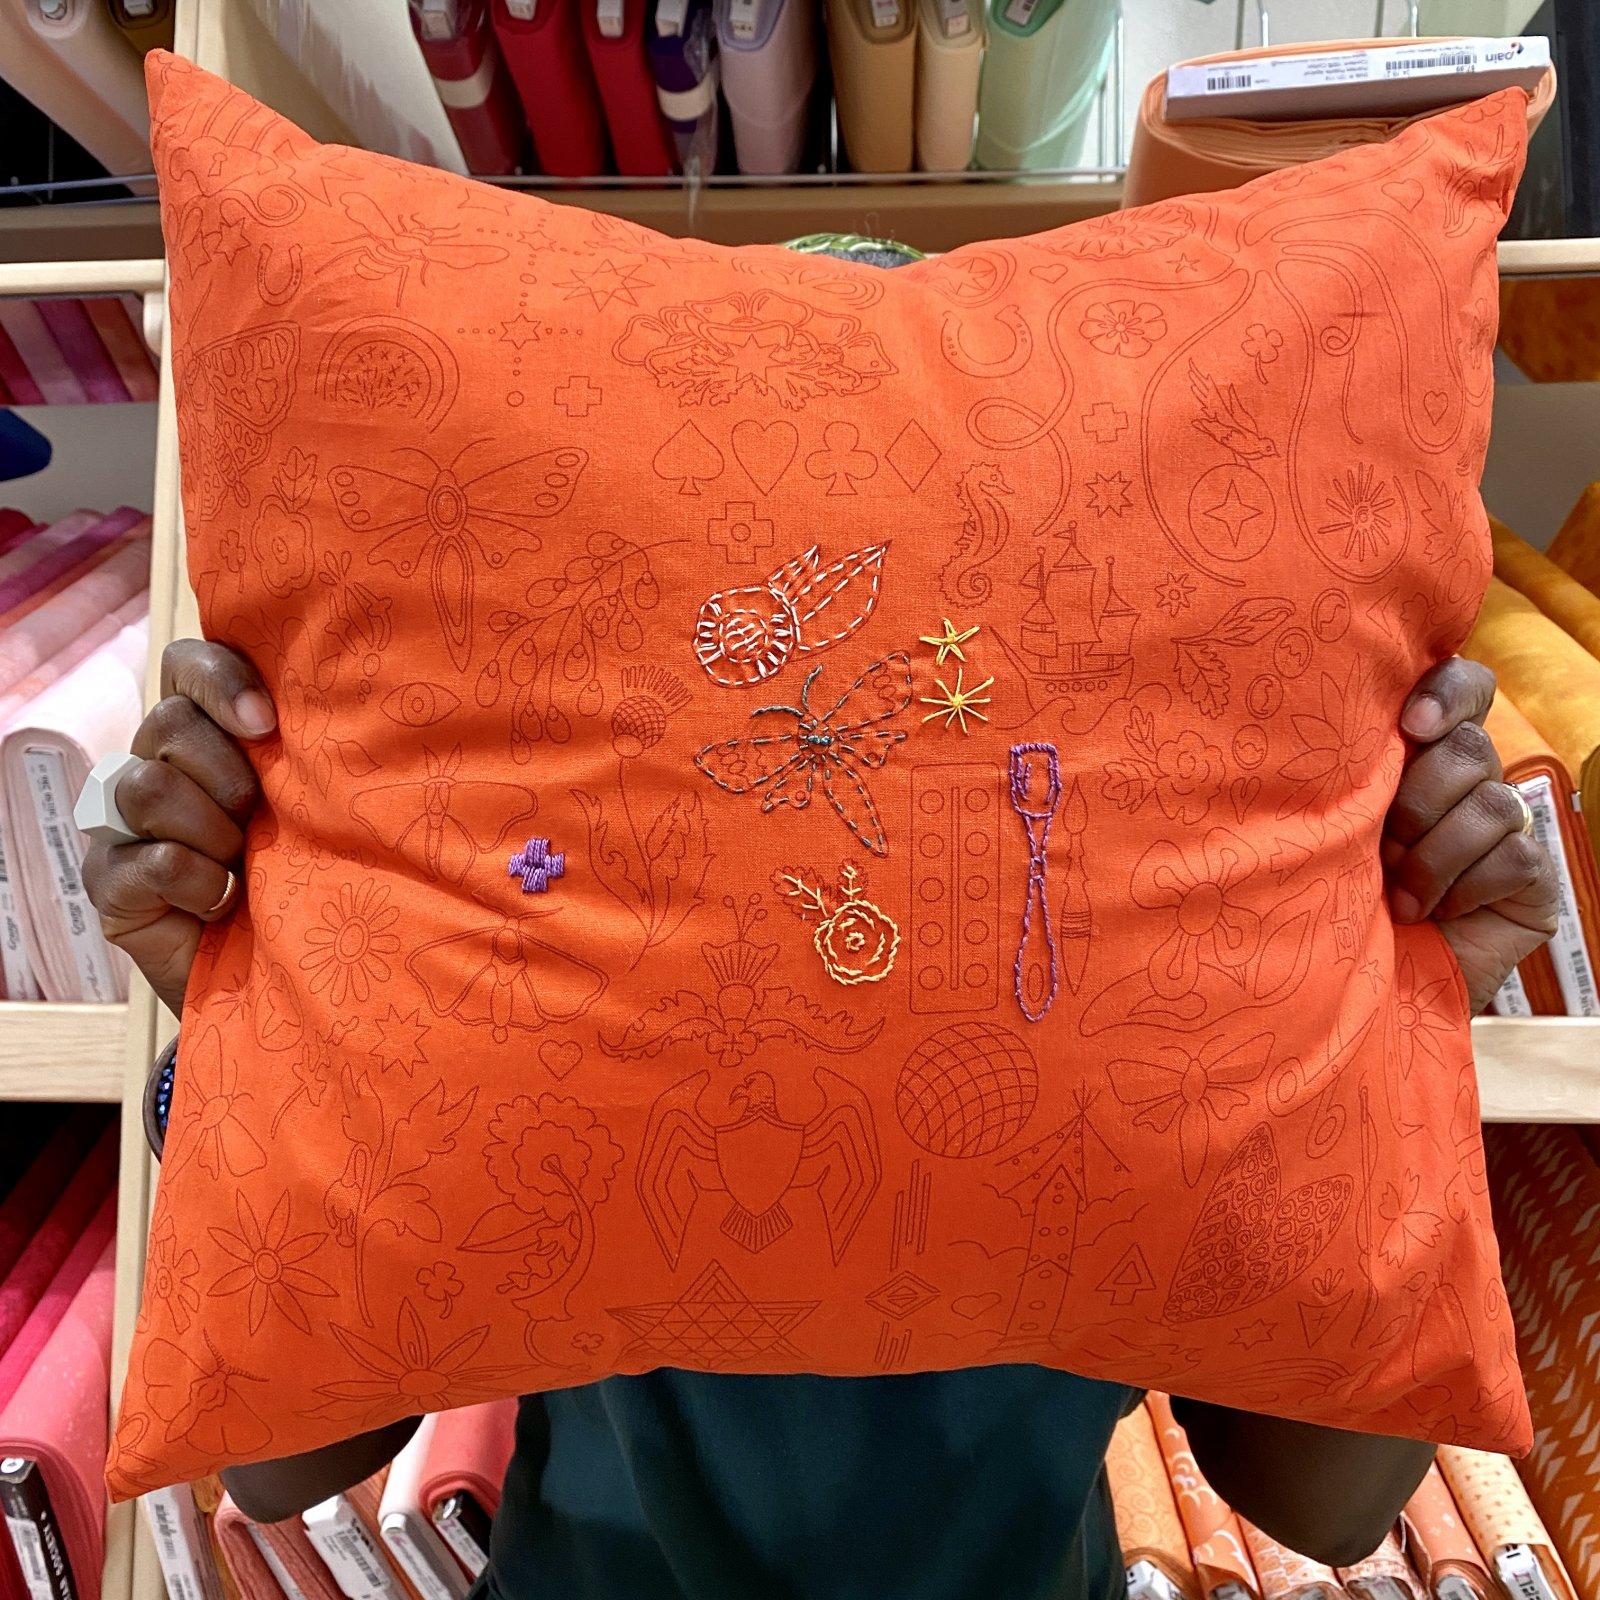 Sun Print 2020 by Alison Glass - Embroidery: Pumpkin